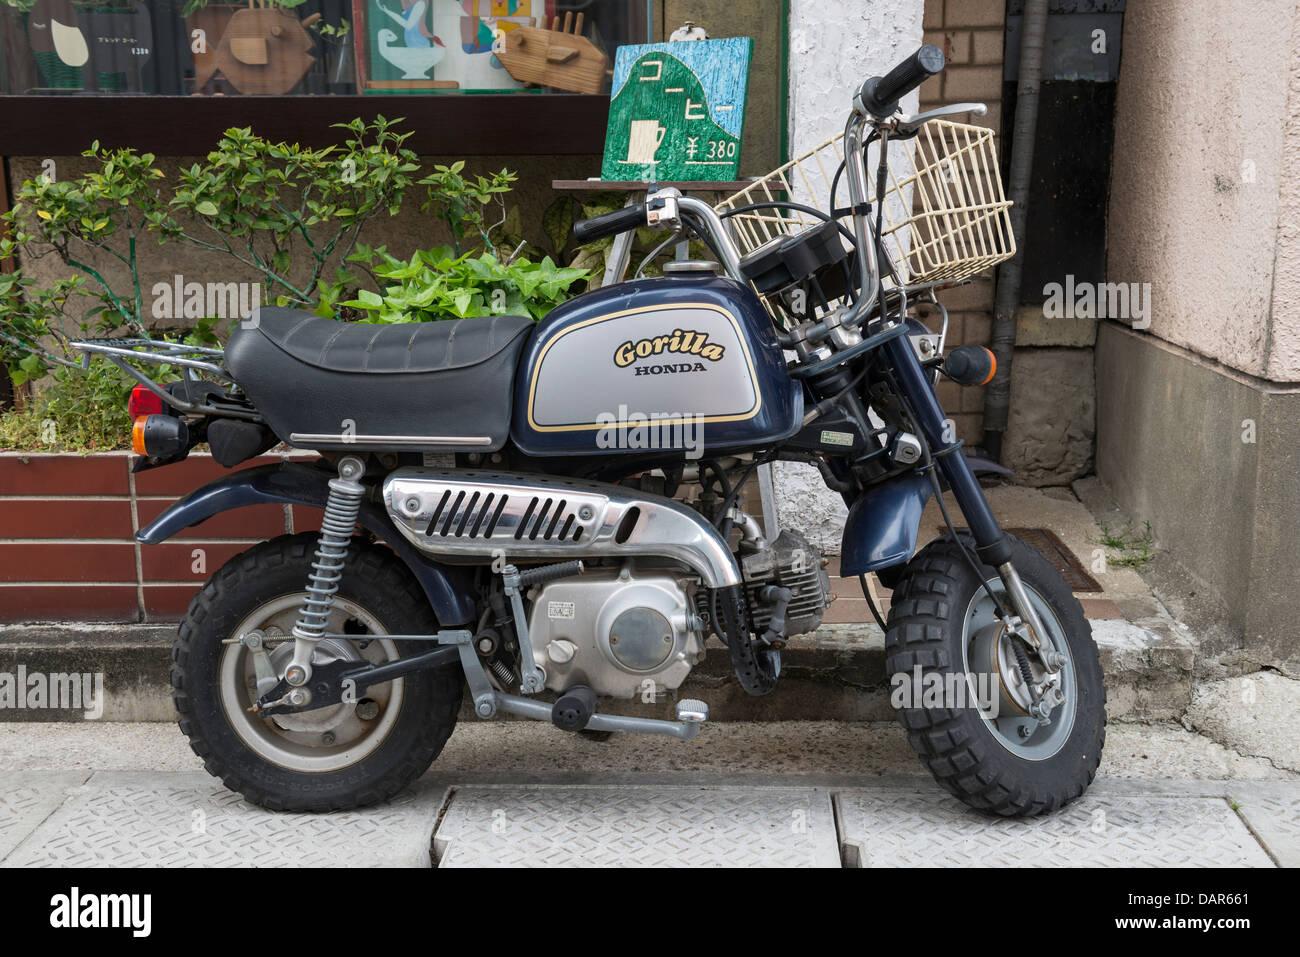 Honda Motorcycle Japan Stock Photos Motorcycles Designs Gorilla Z Series Nagasaki Image